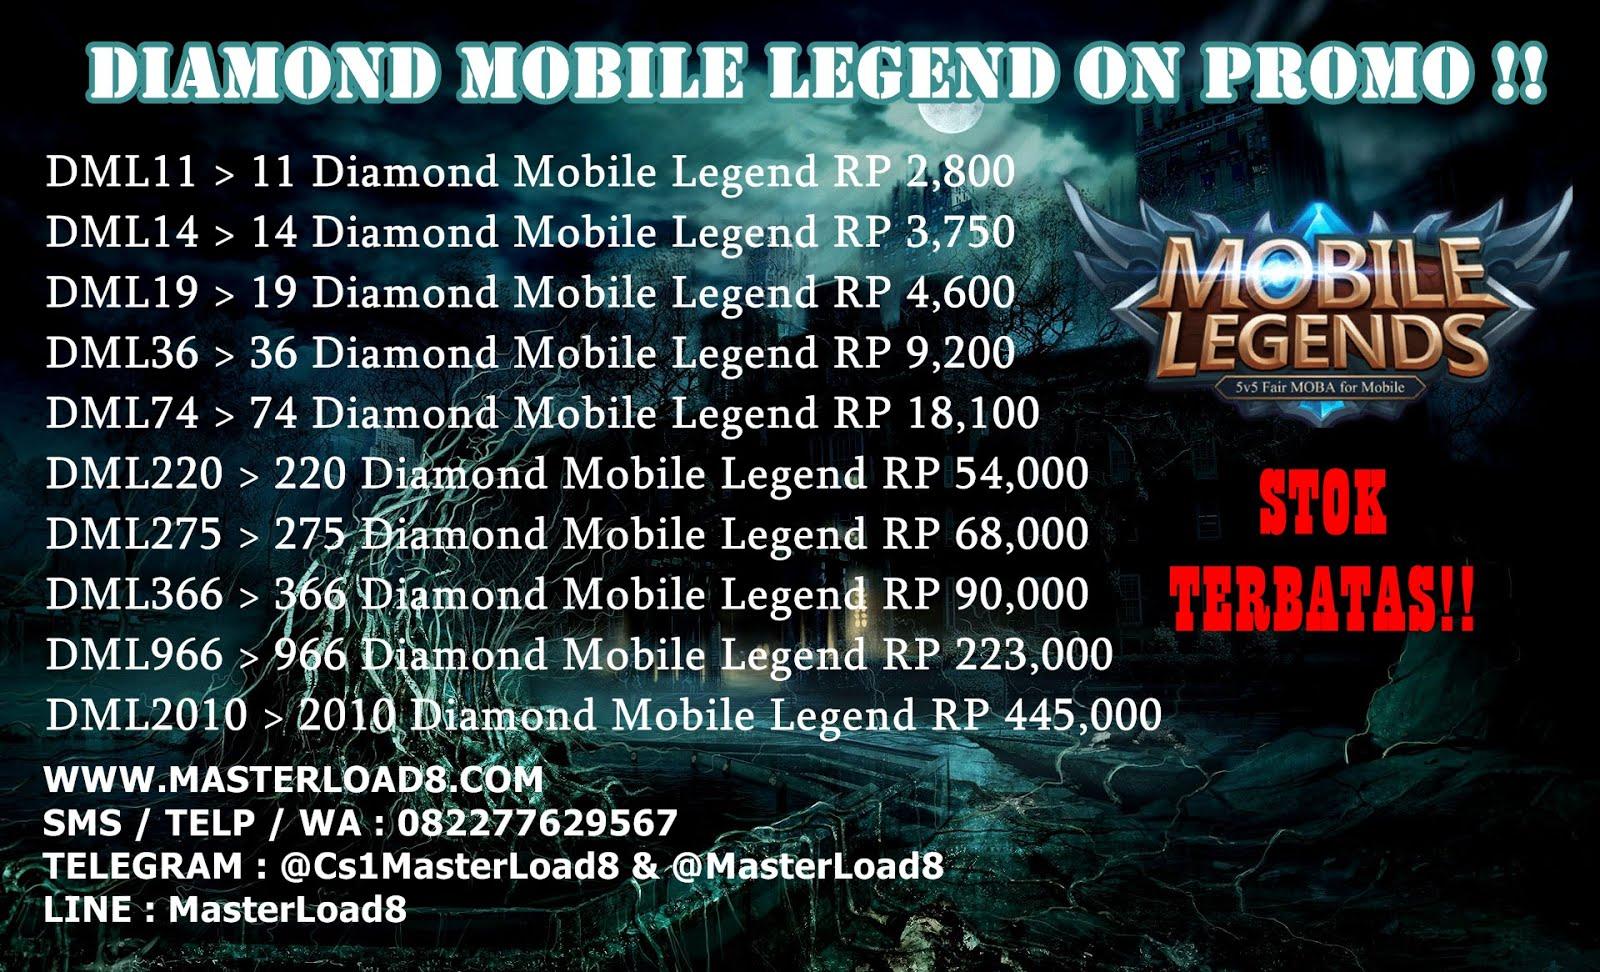 Diamond Mobile Legend On Promo Server Pulsa Masterload8 Topup 220 Diamonds